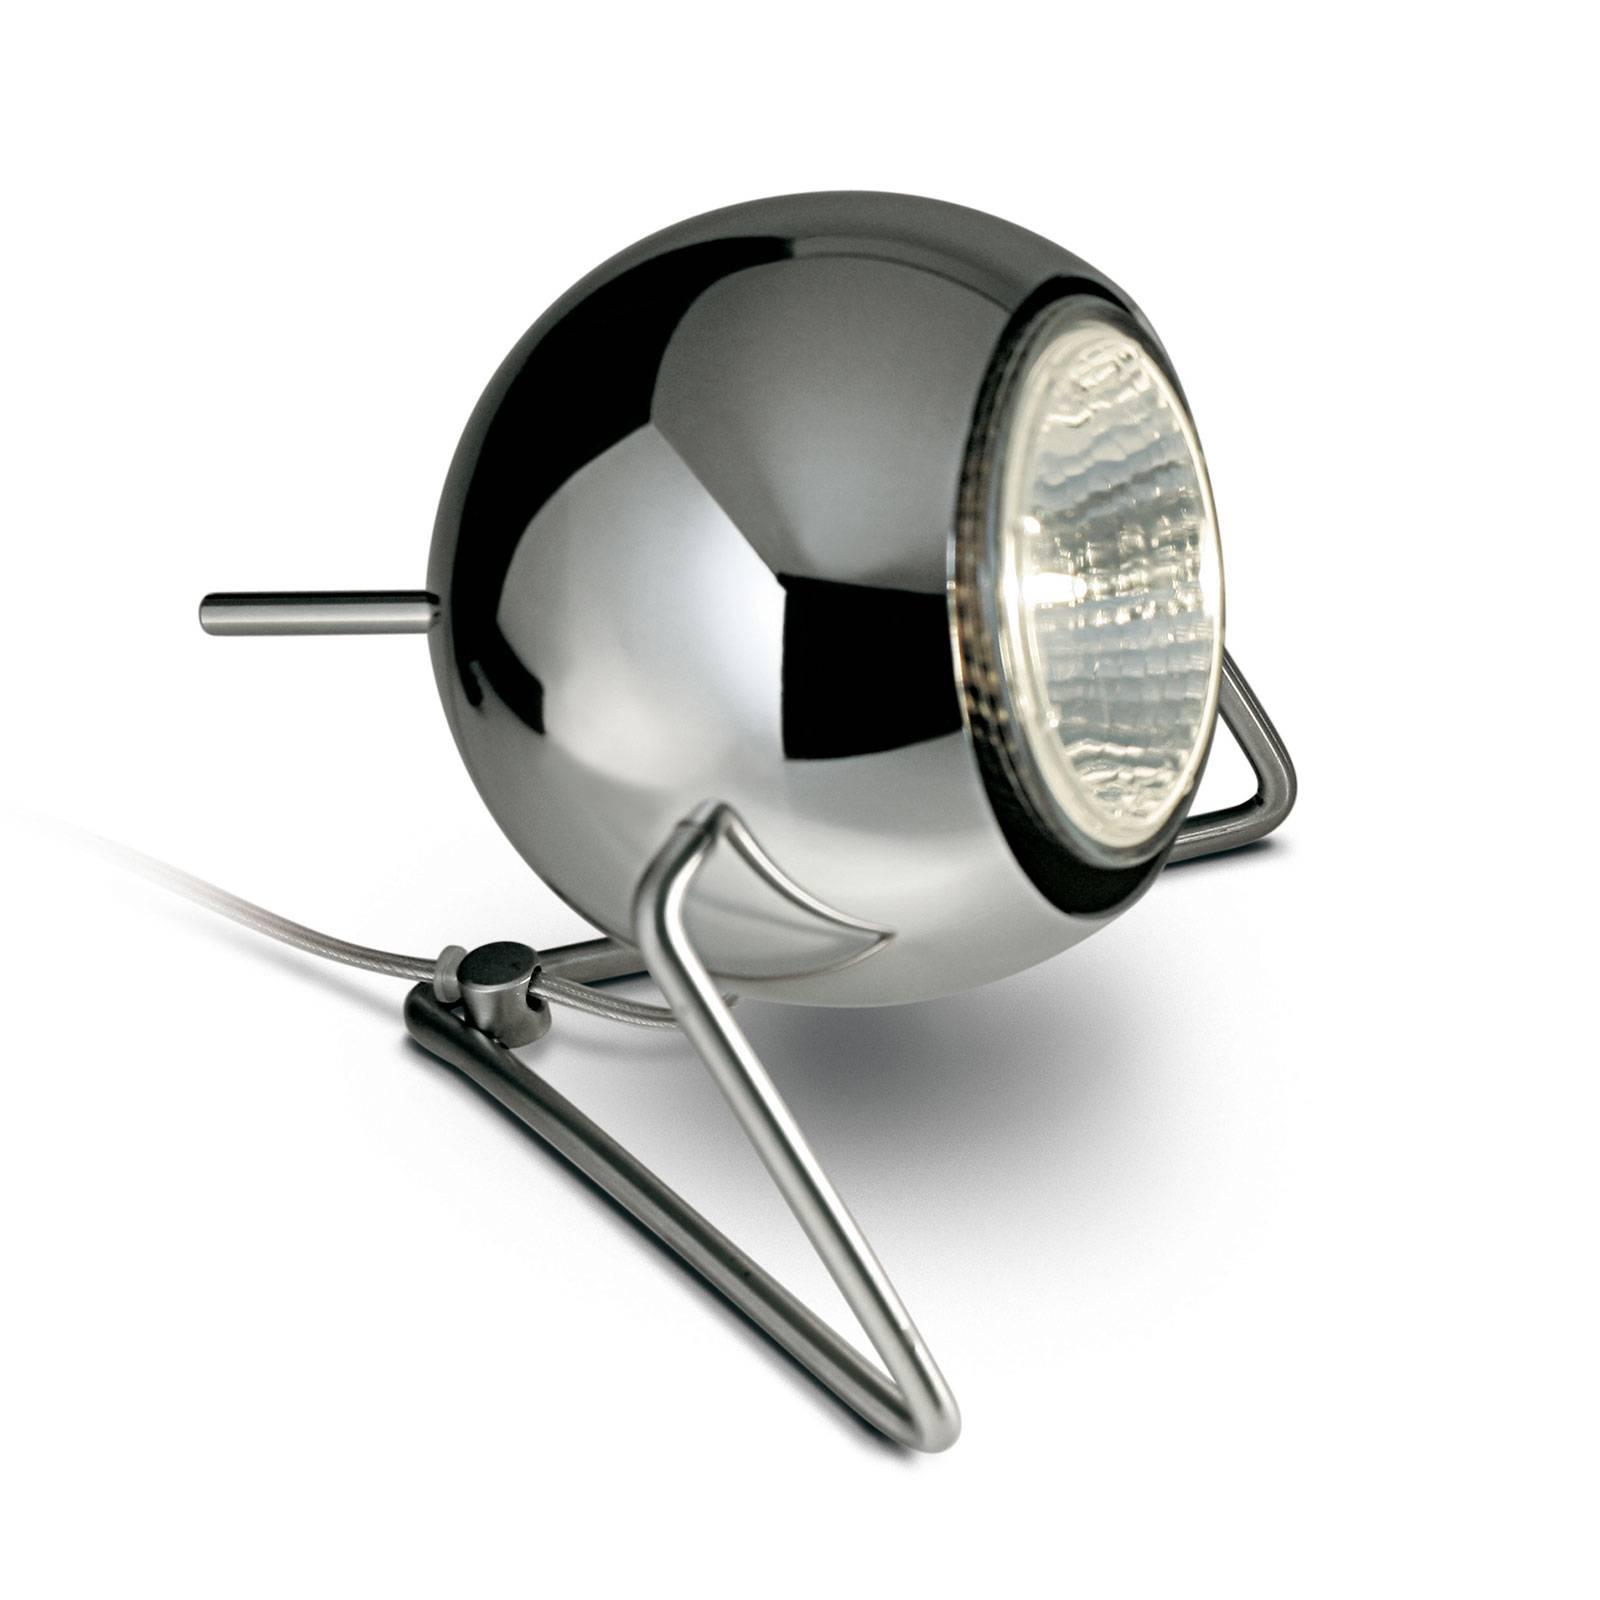 Fabbian Beluga Steel lampe à poser chromée, Ø 9cm